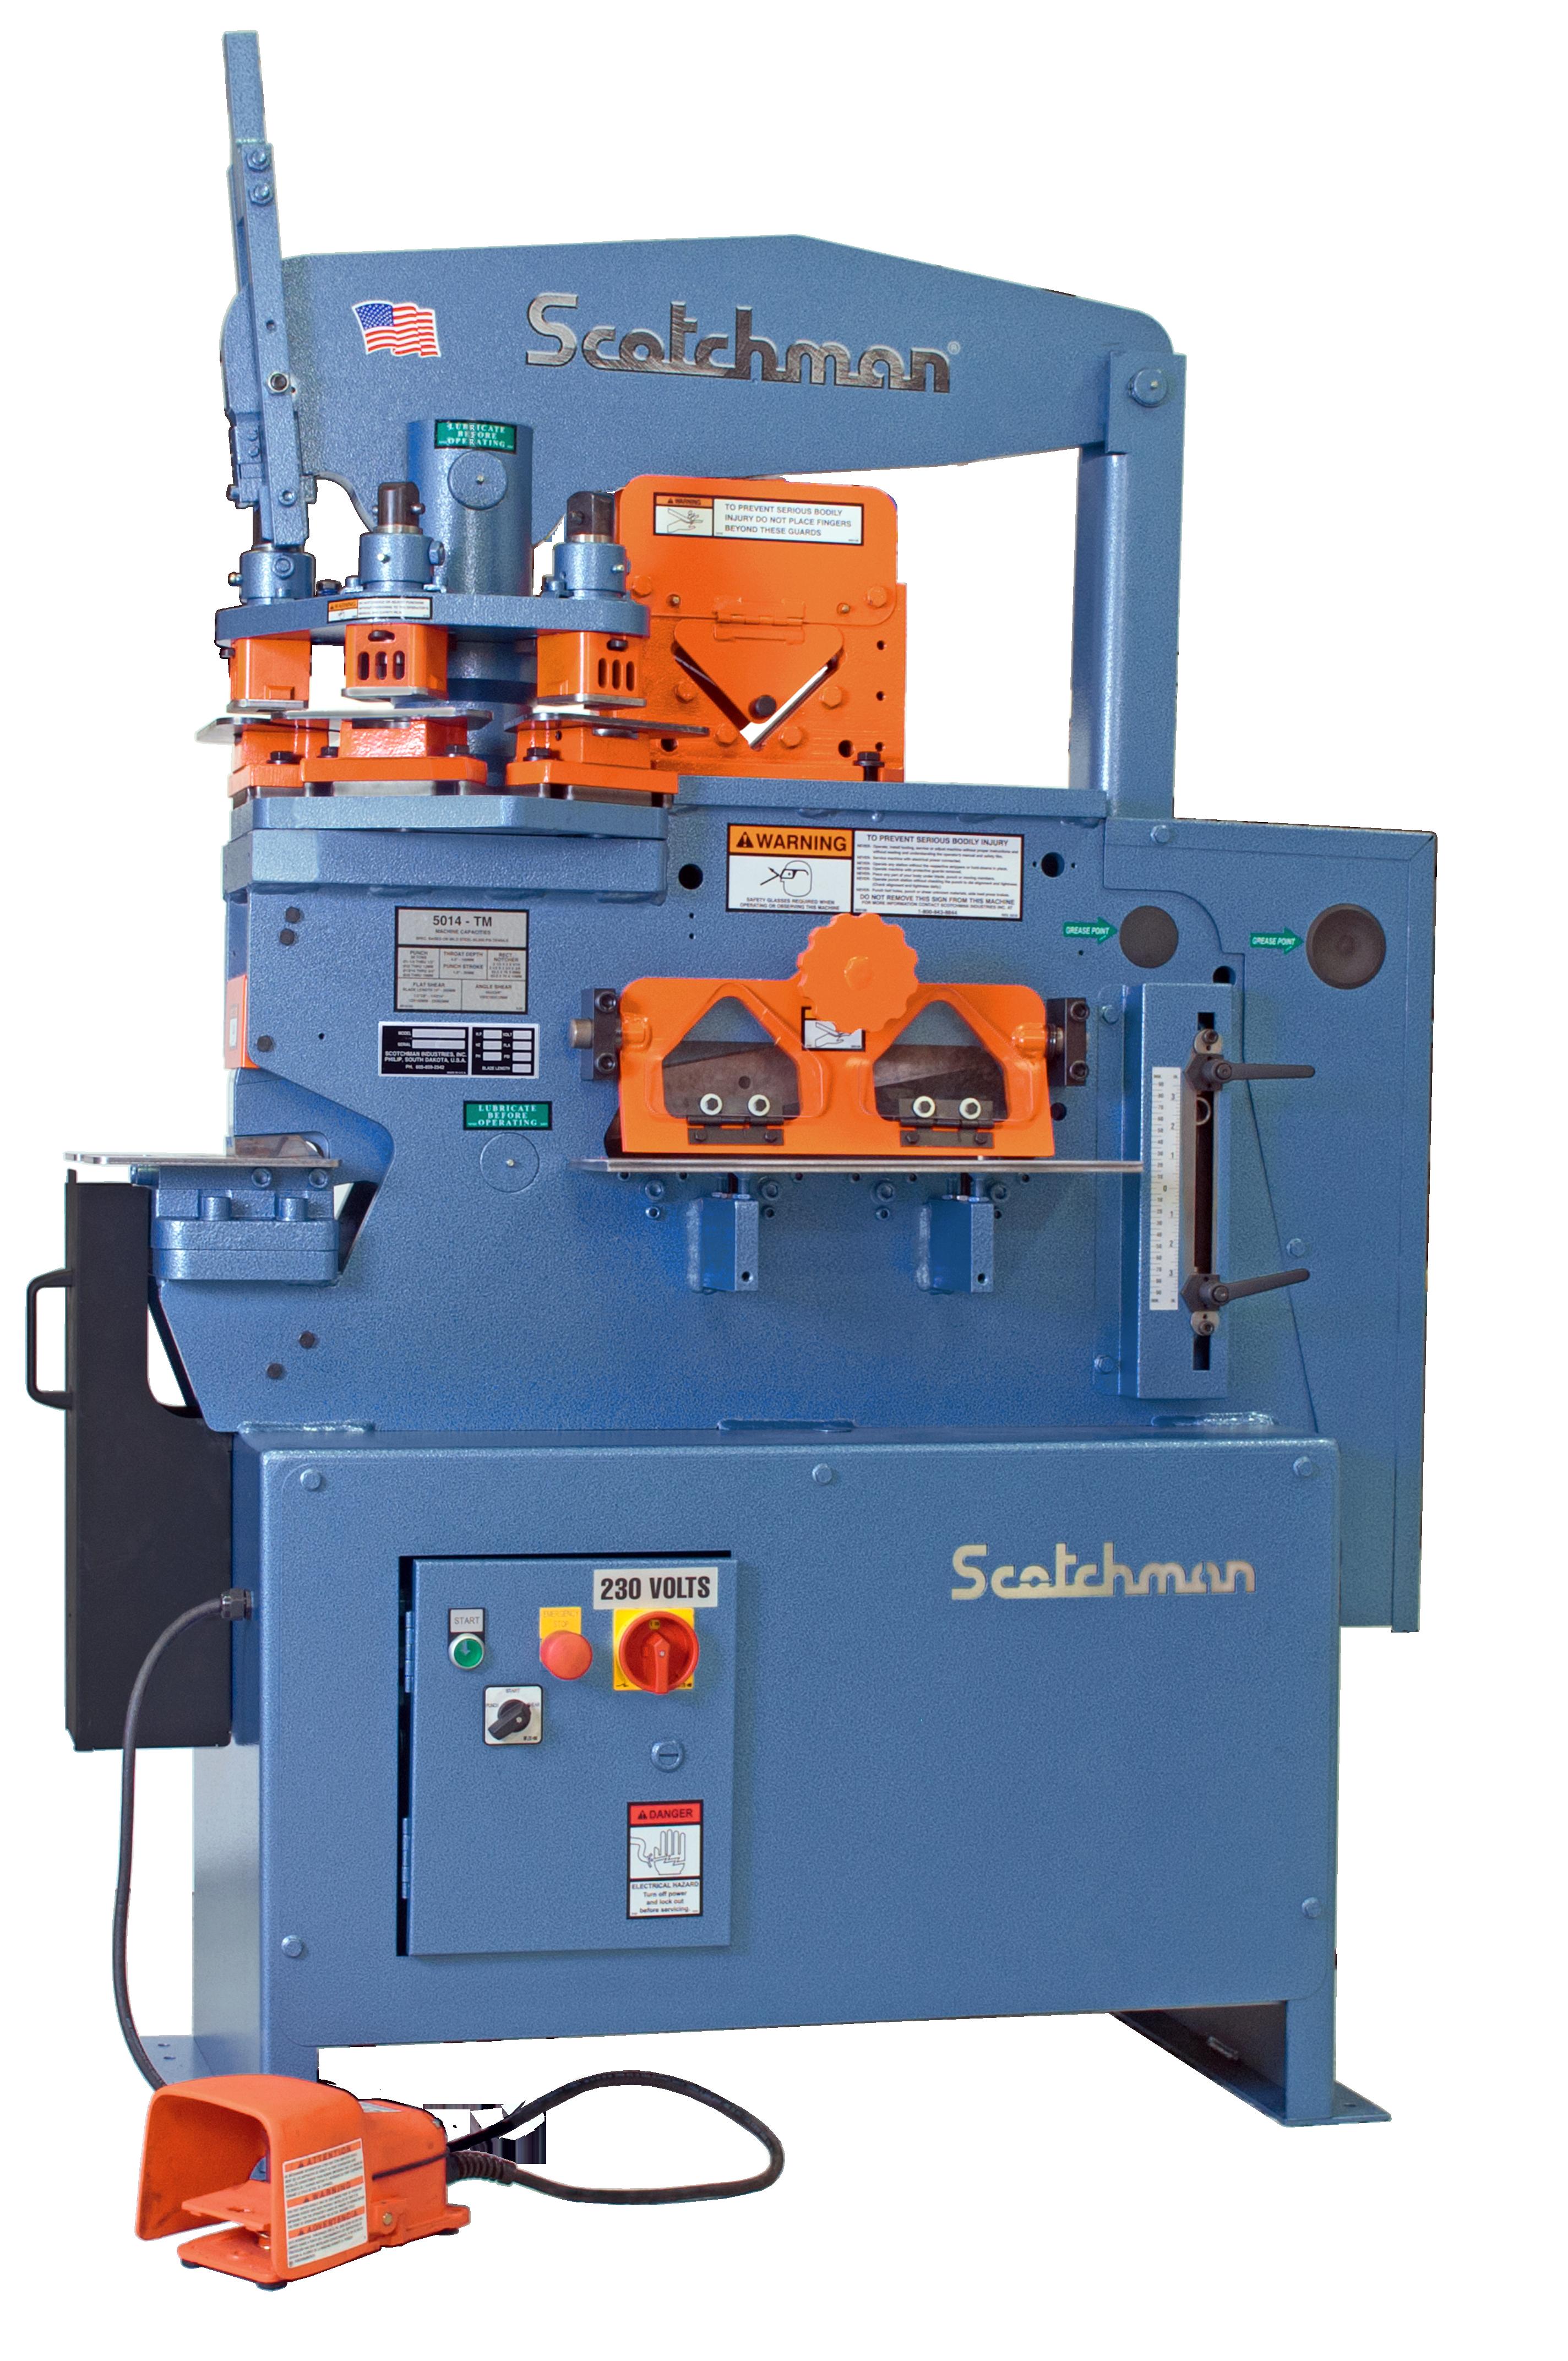 Scotchman Iron Worker 5014ETcc